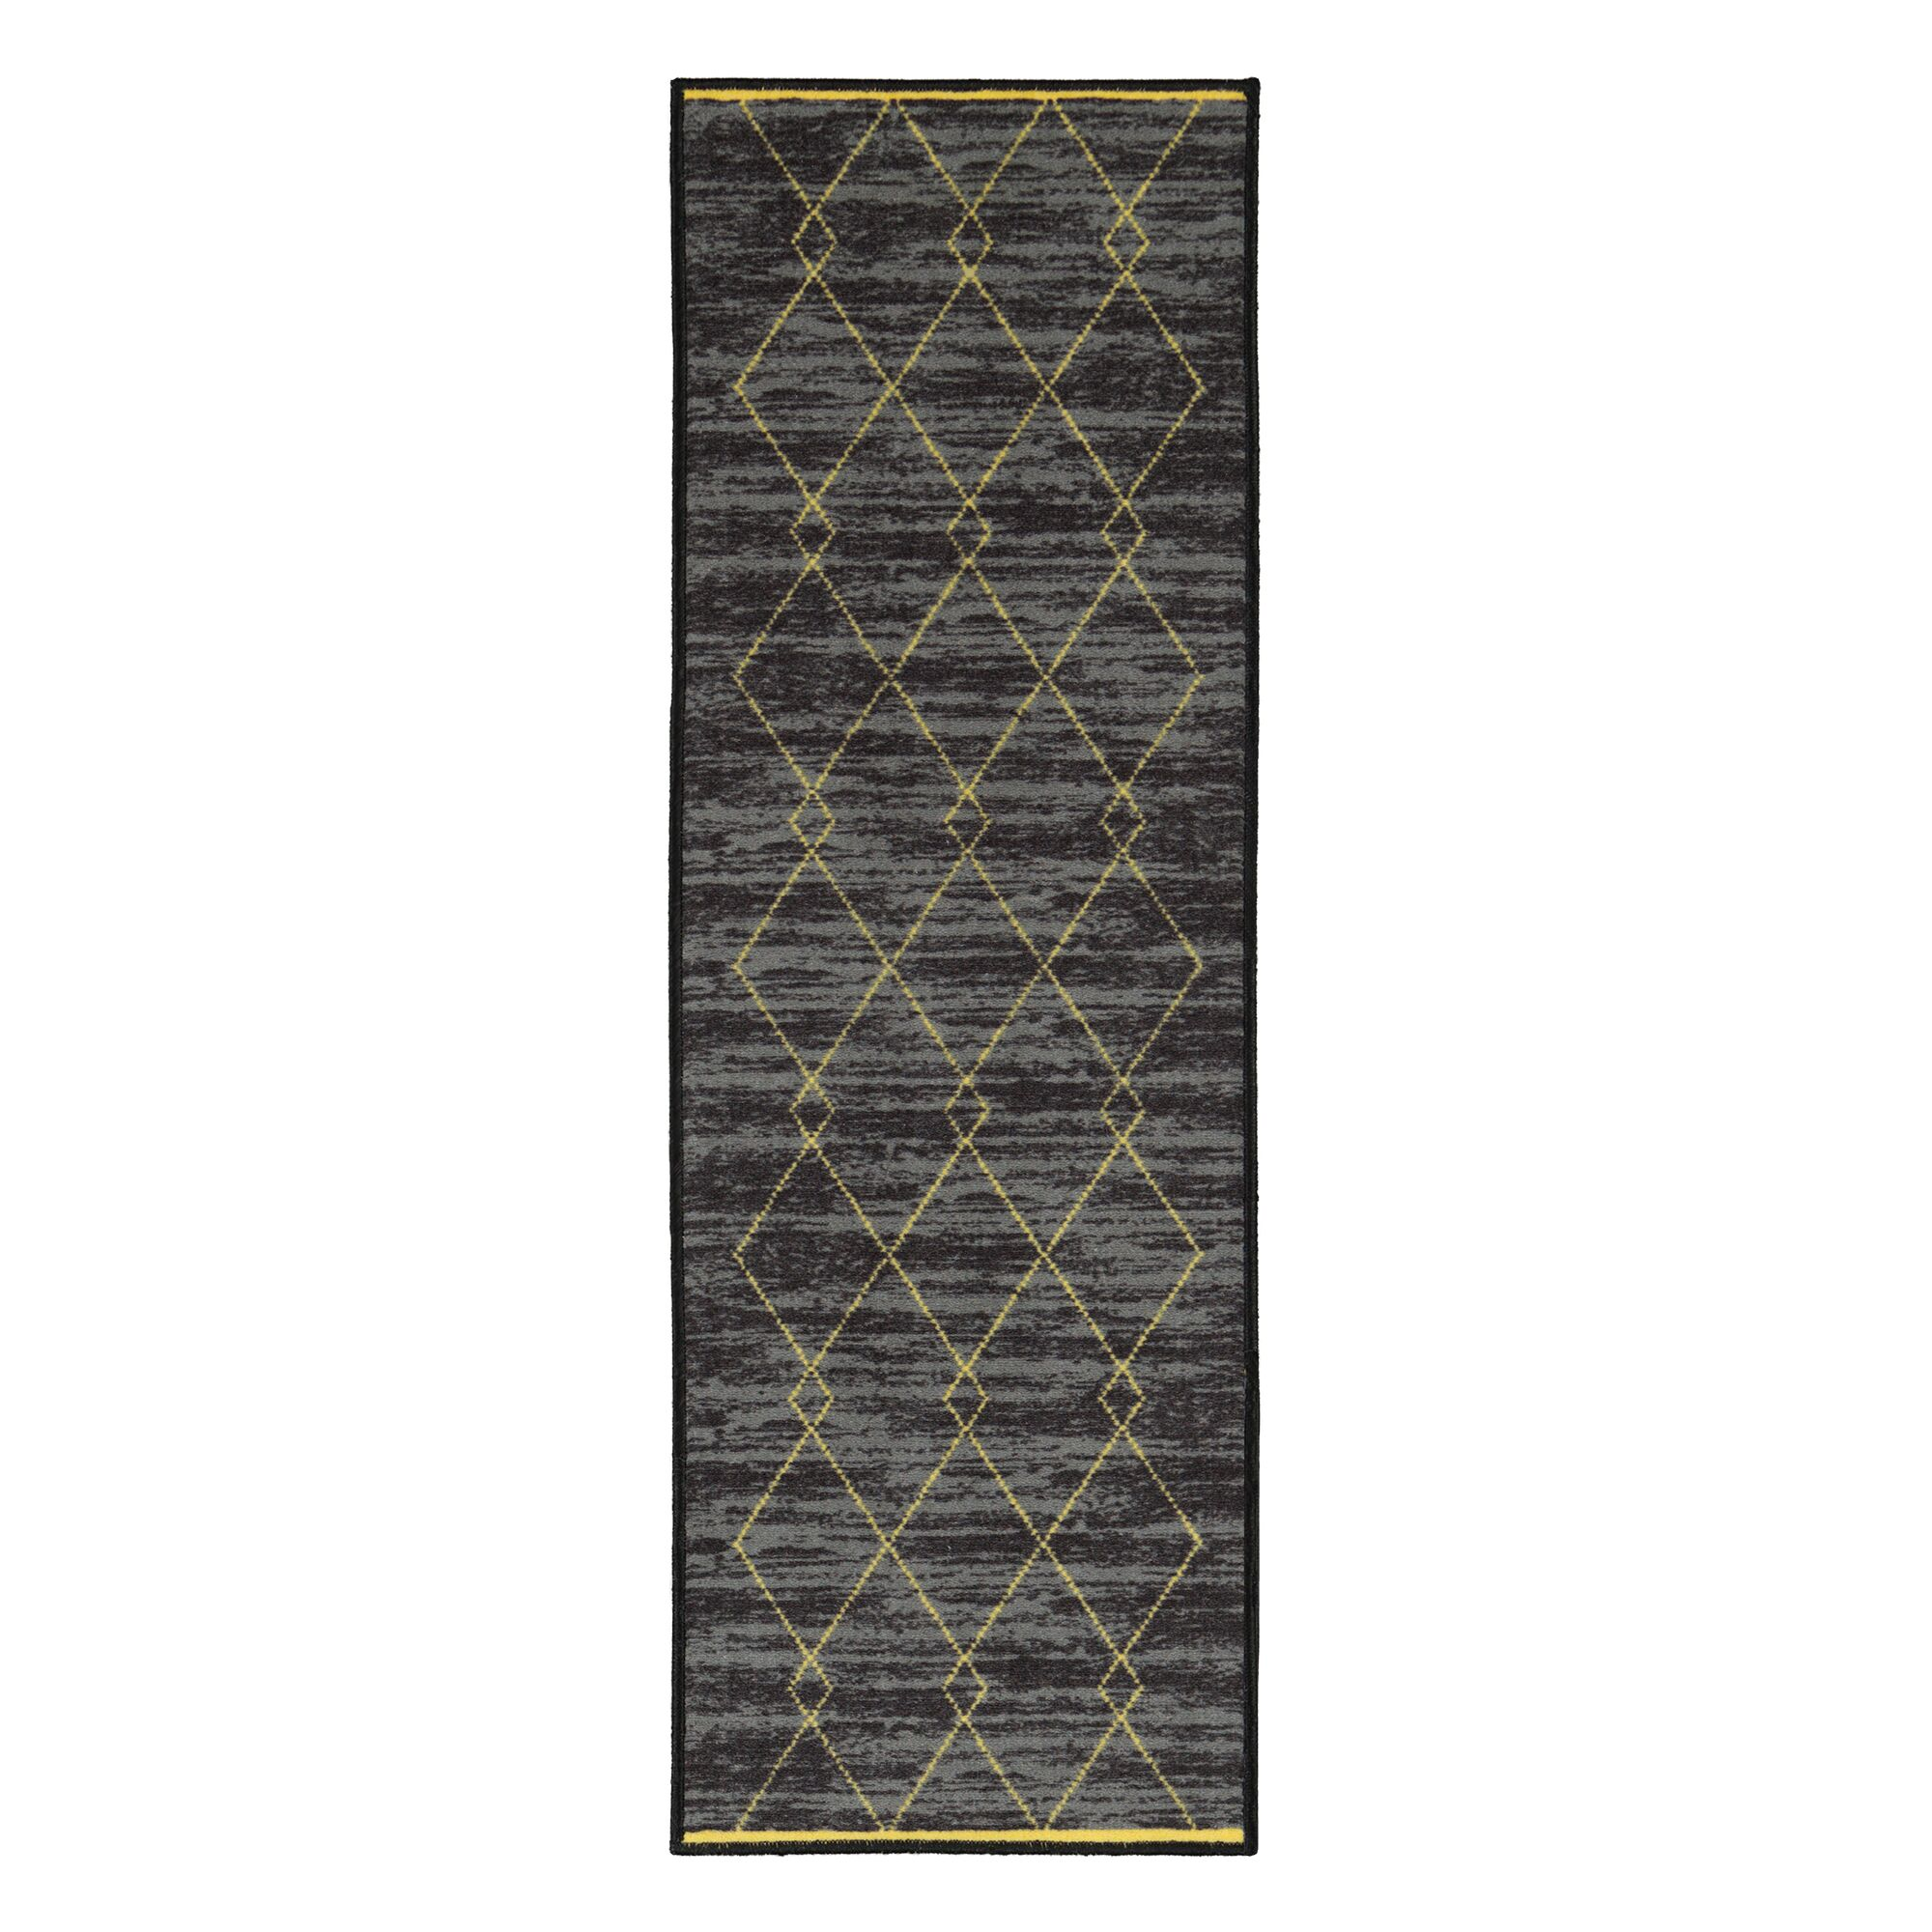 Vathylakas Diamond Trellis Black/Yellow Area Rugs Rug Size: 8'2